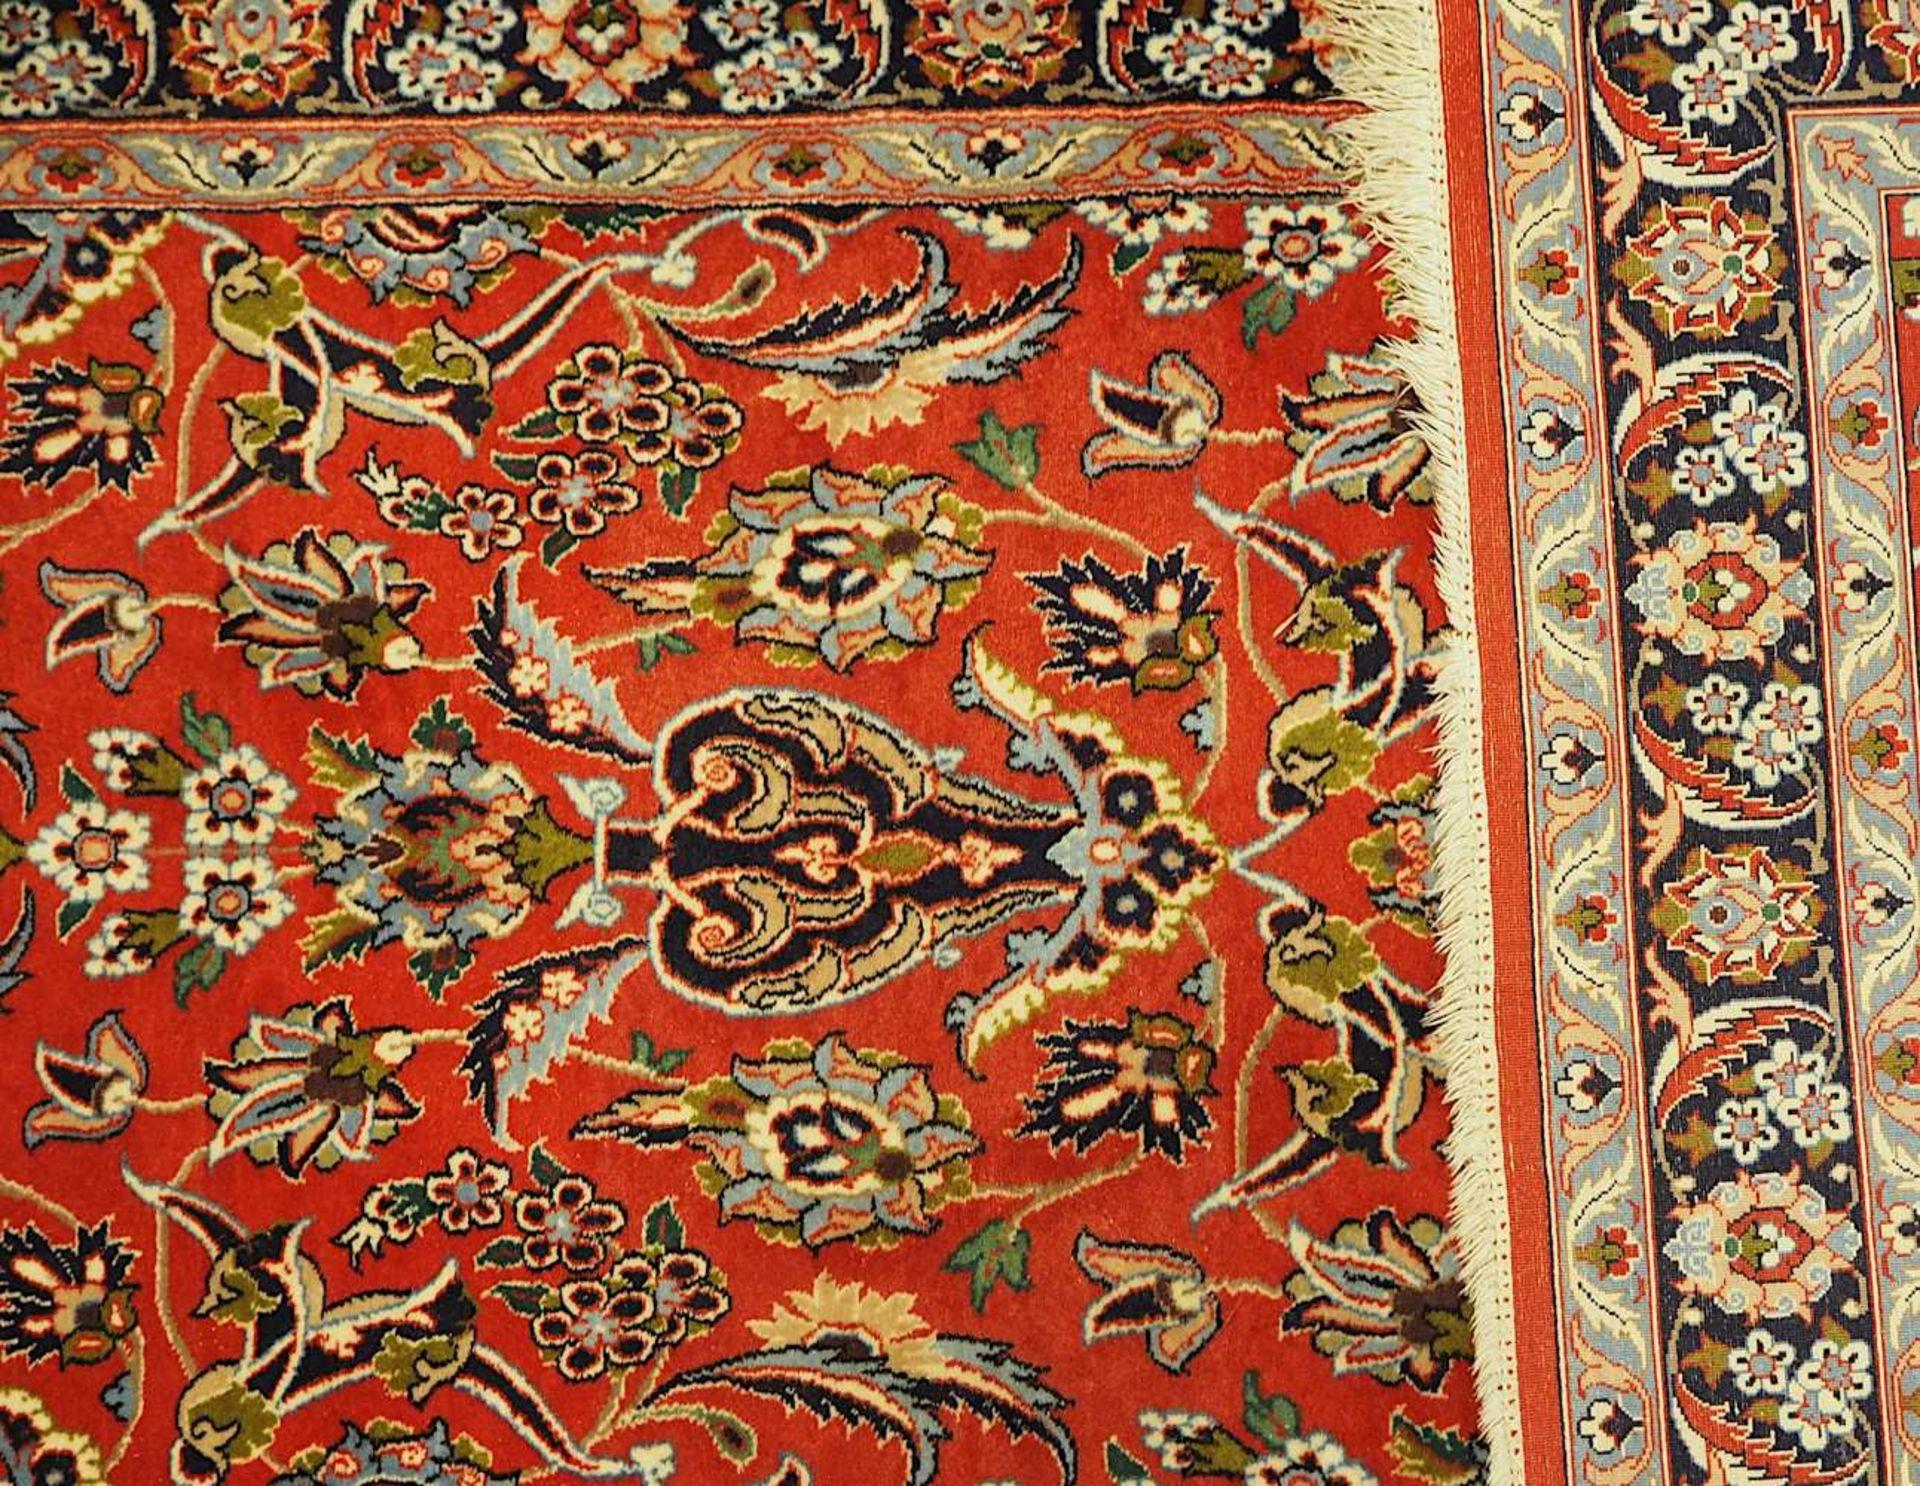 2 Orientgalerien 20. Jh., z.T. mit Seidenanteil je rotgrundig mit floralem Dekor, je F - Bild 3 aus 3